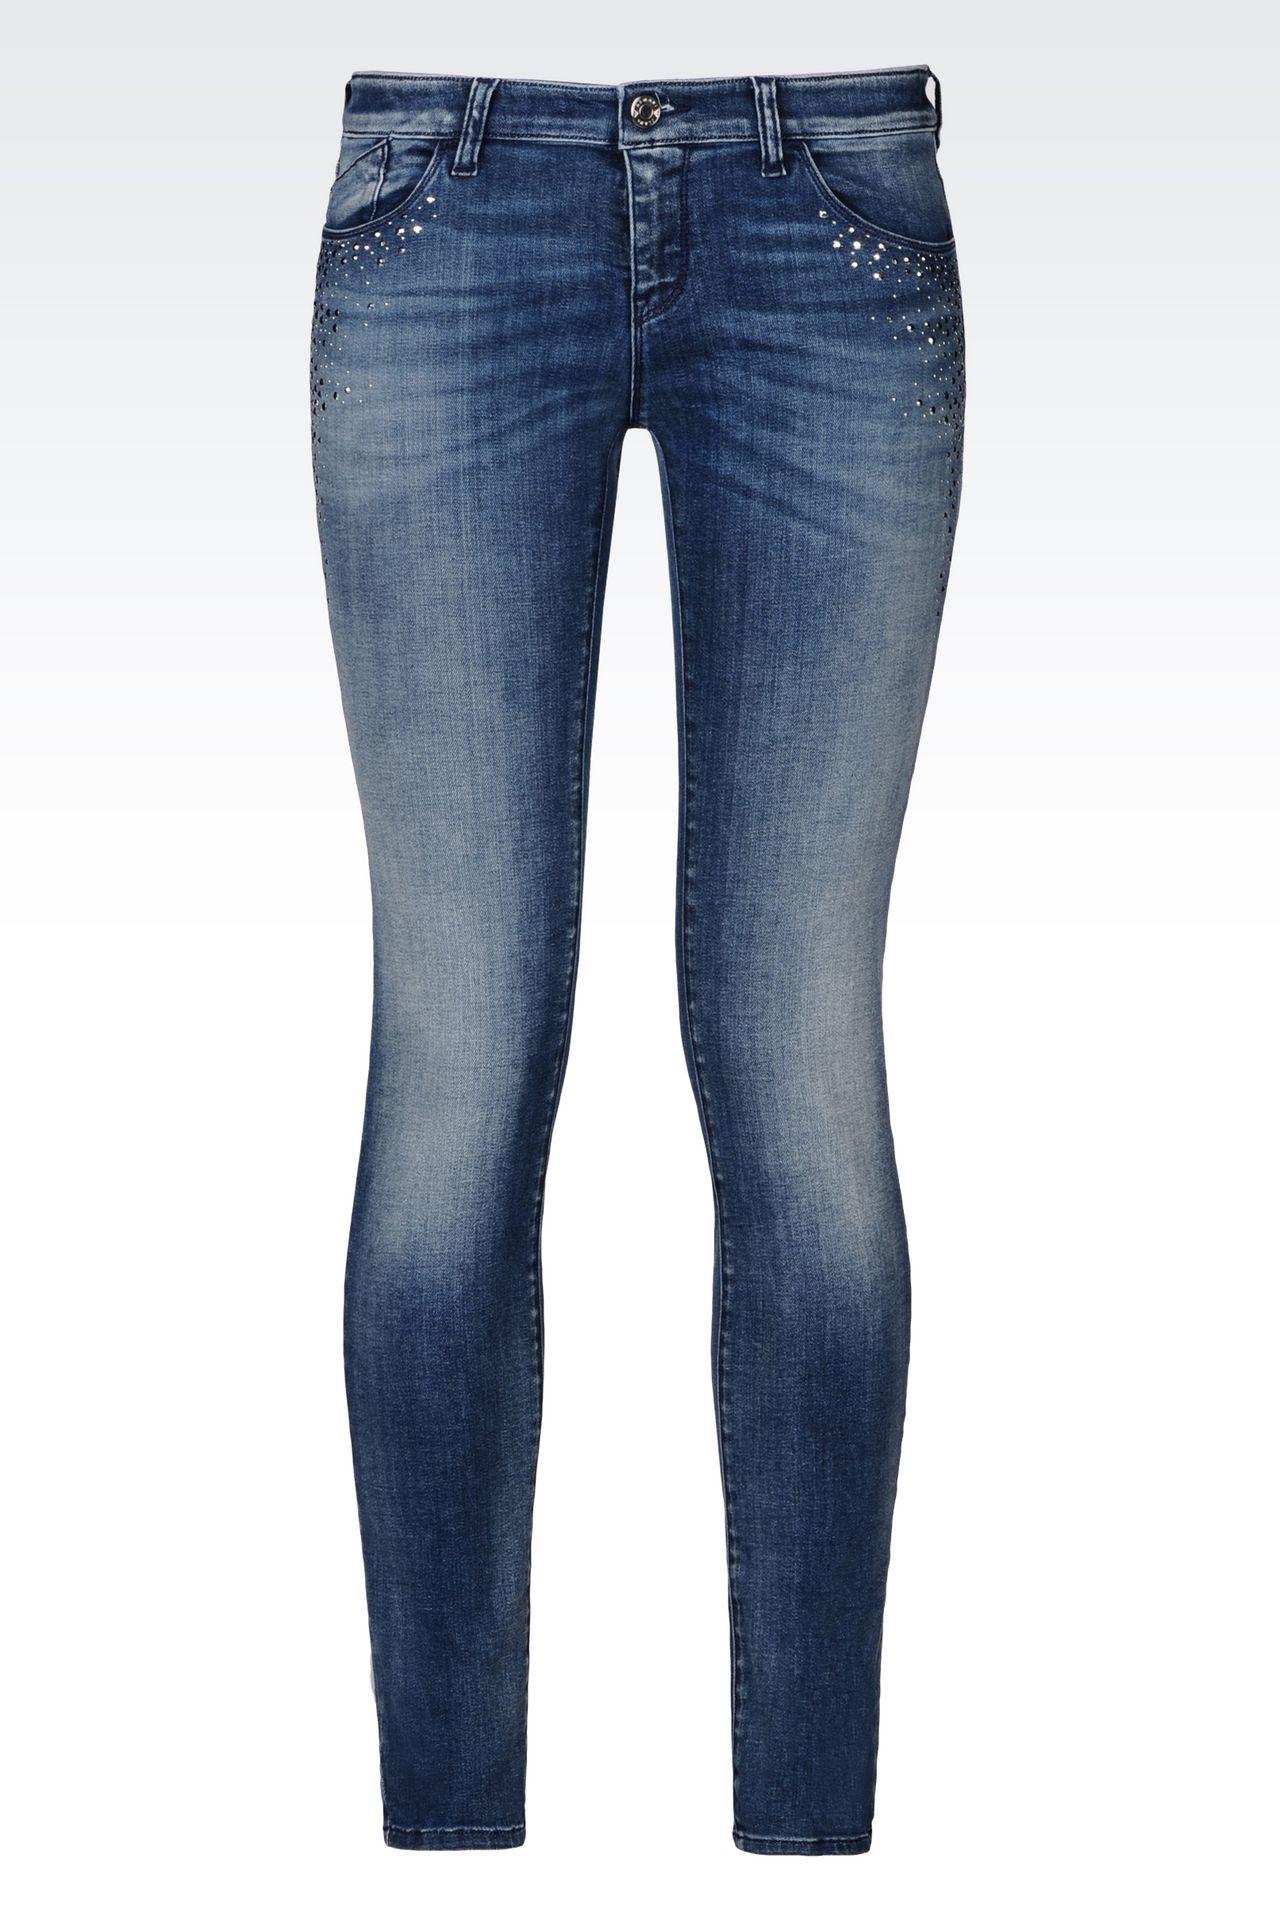 J06 SKINNY FIT LIGHT WASH JEANS: Jeans Women by Armani - 0